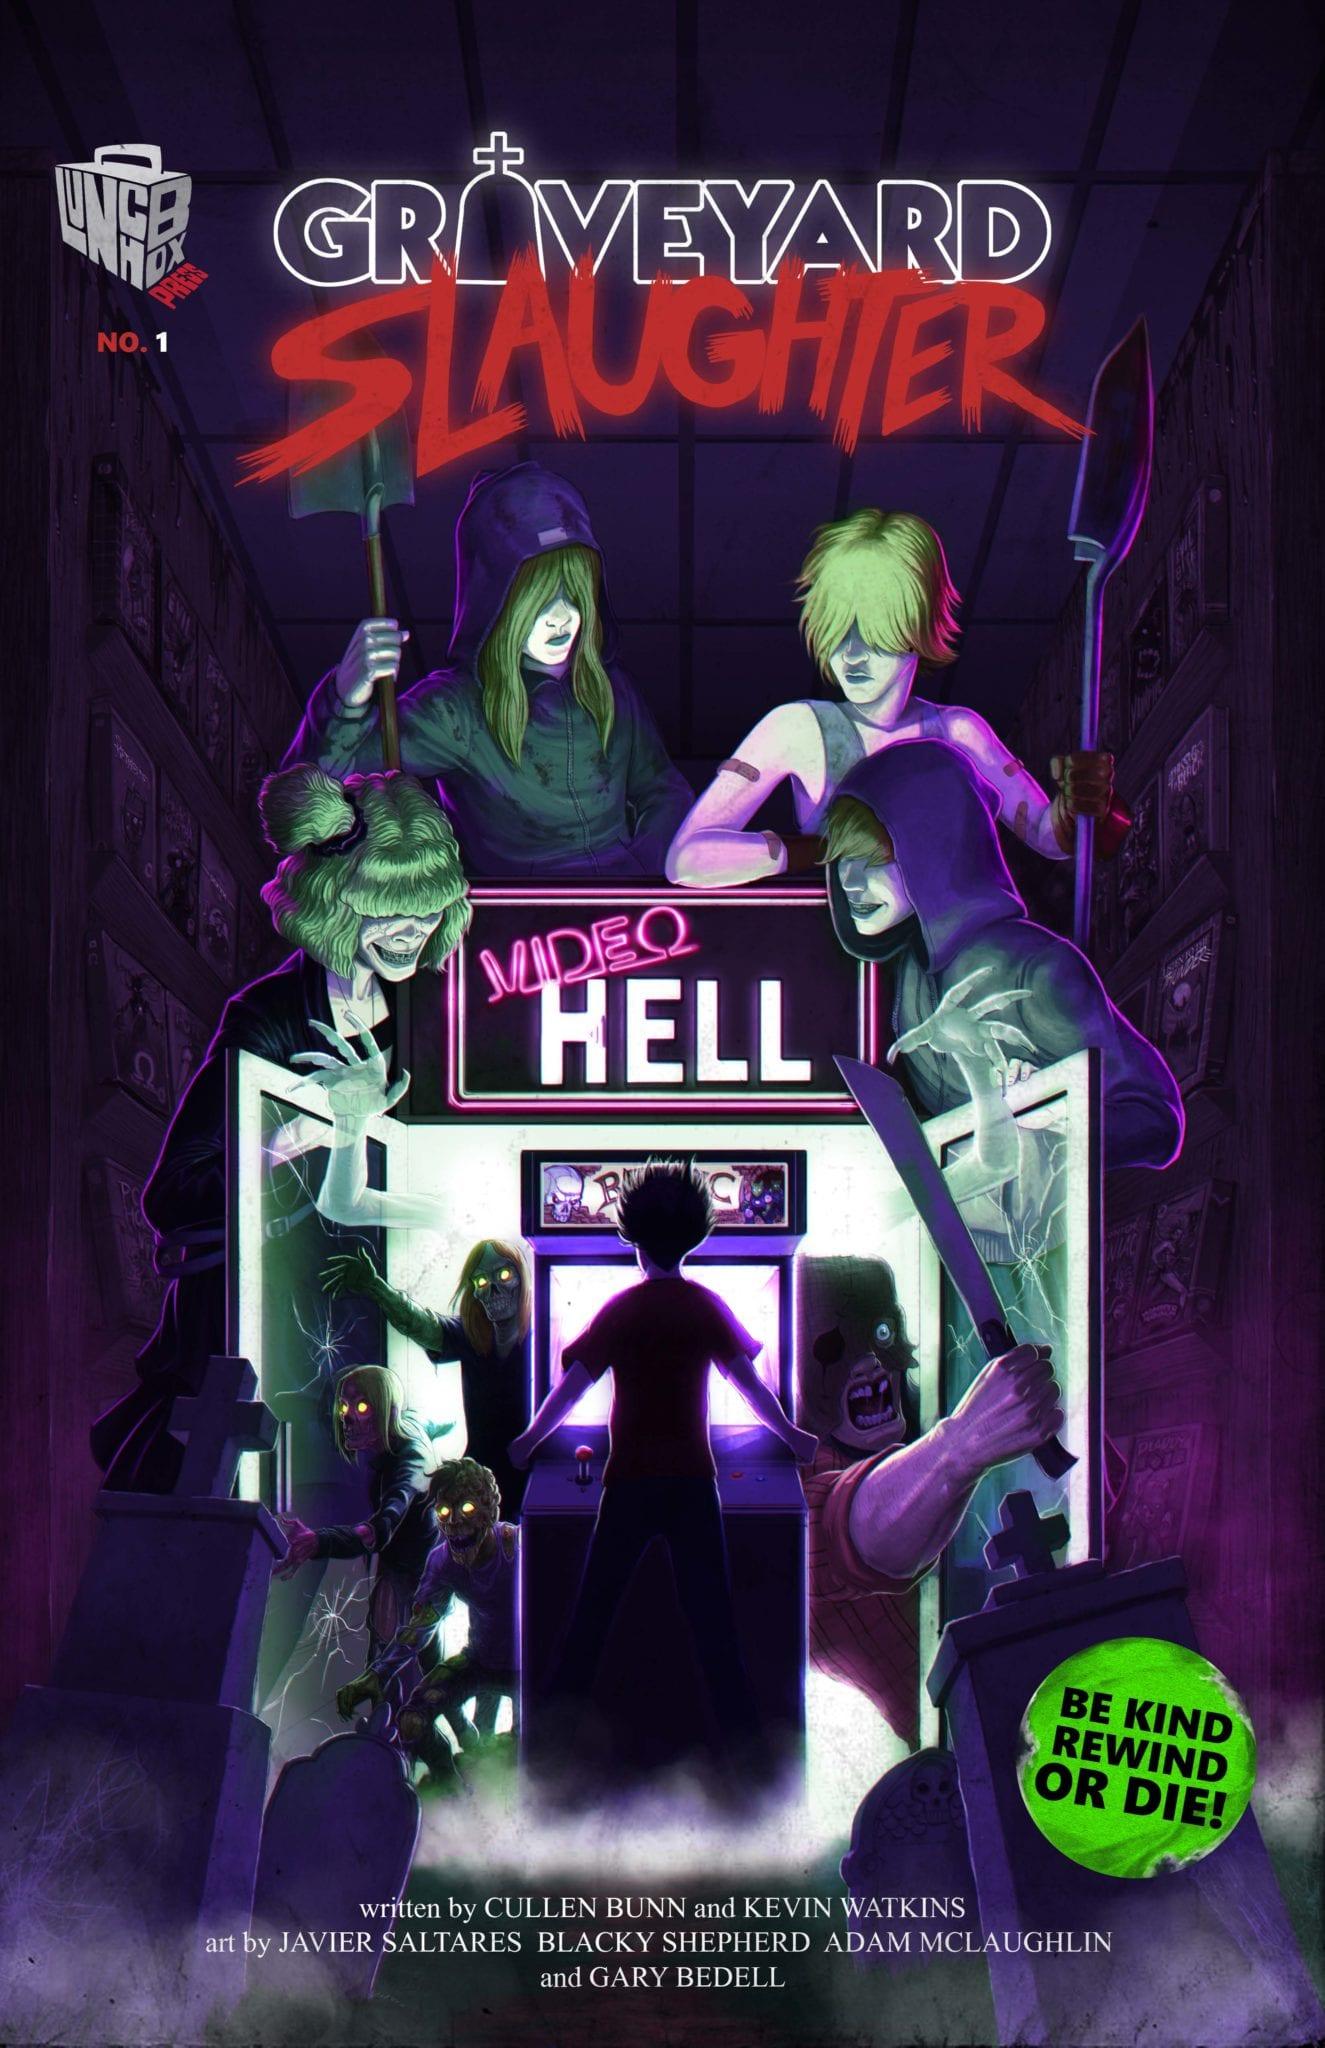 graveyard-slaughter-cover